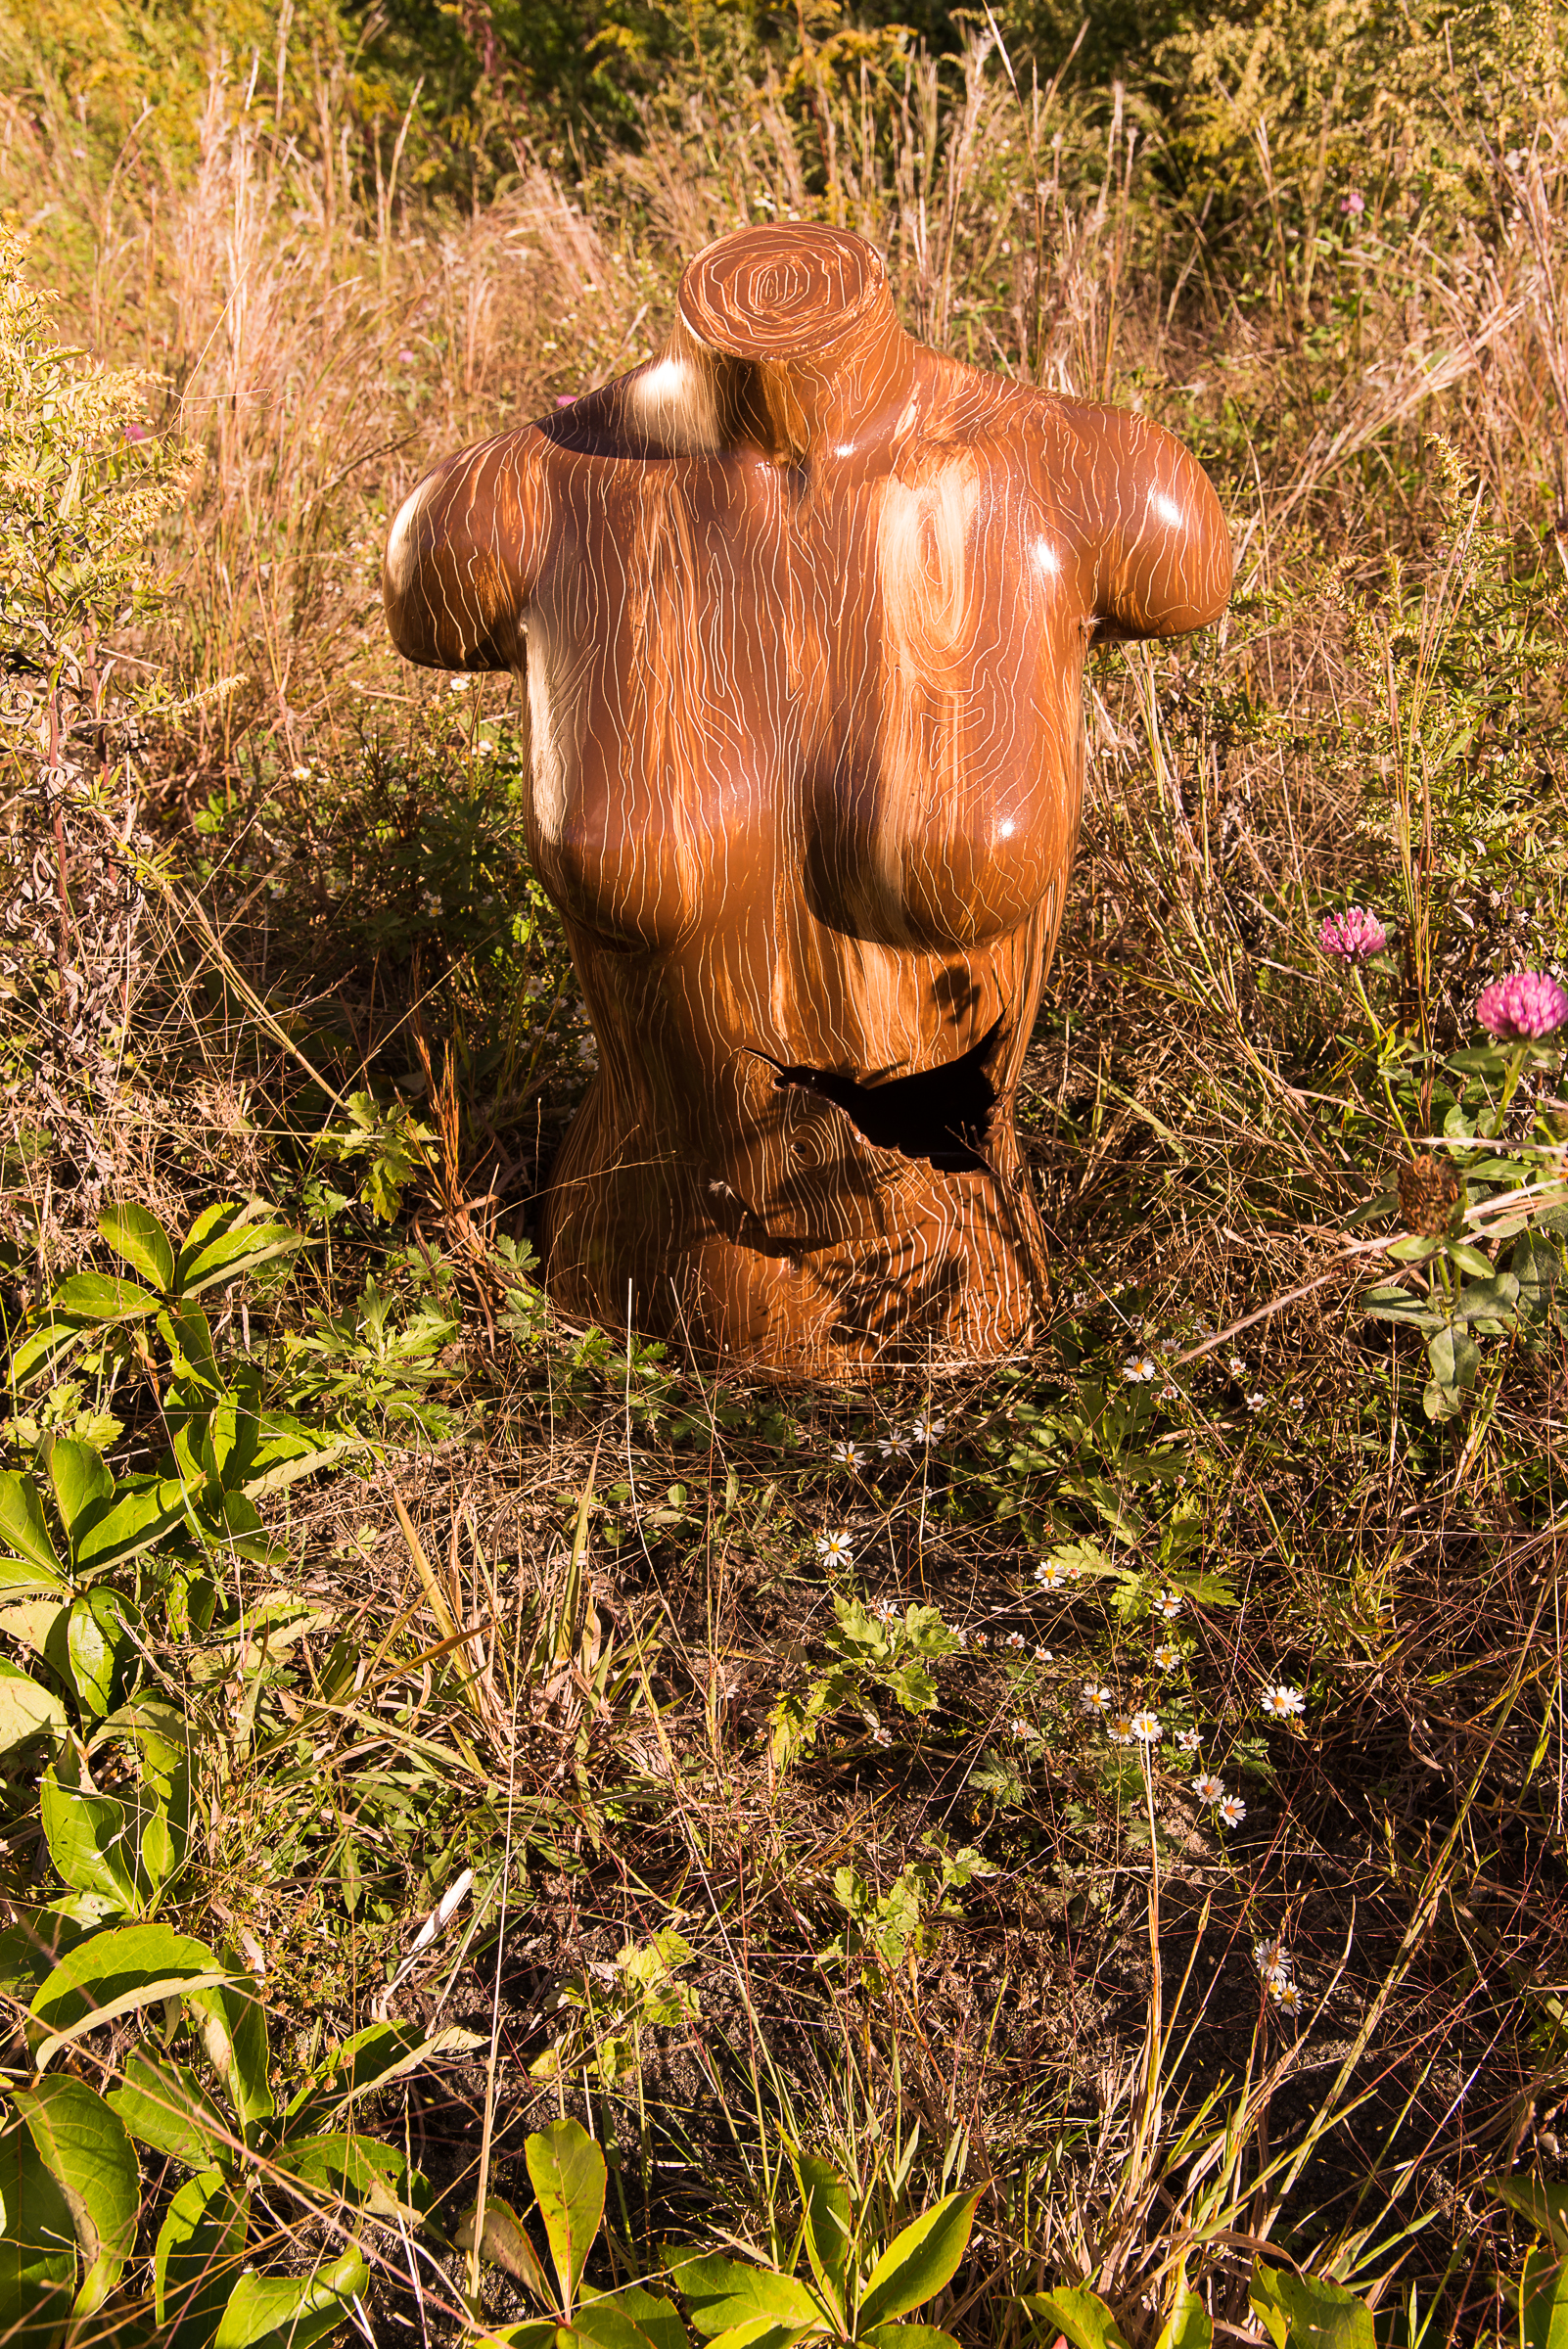 walnut torso